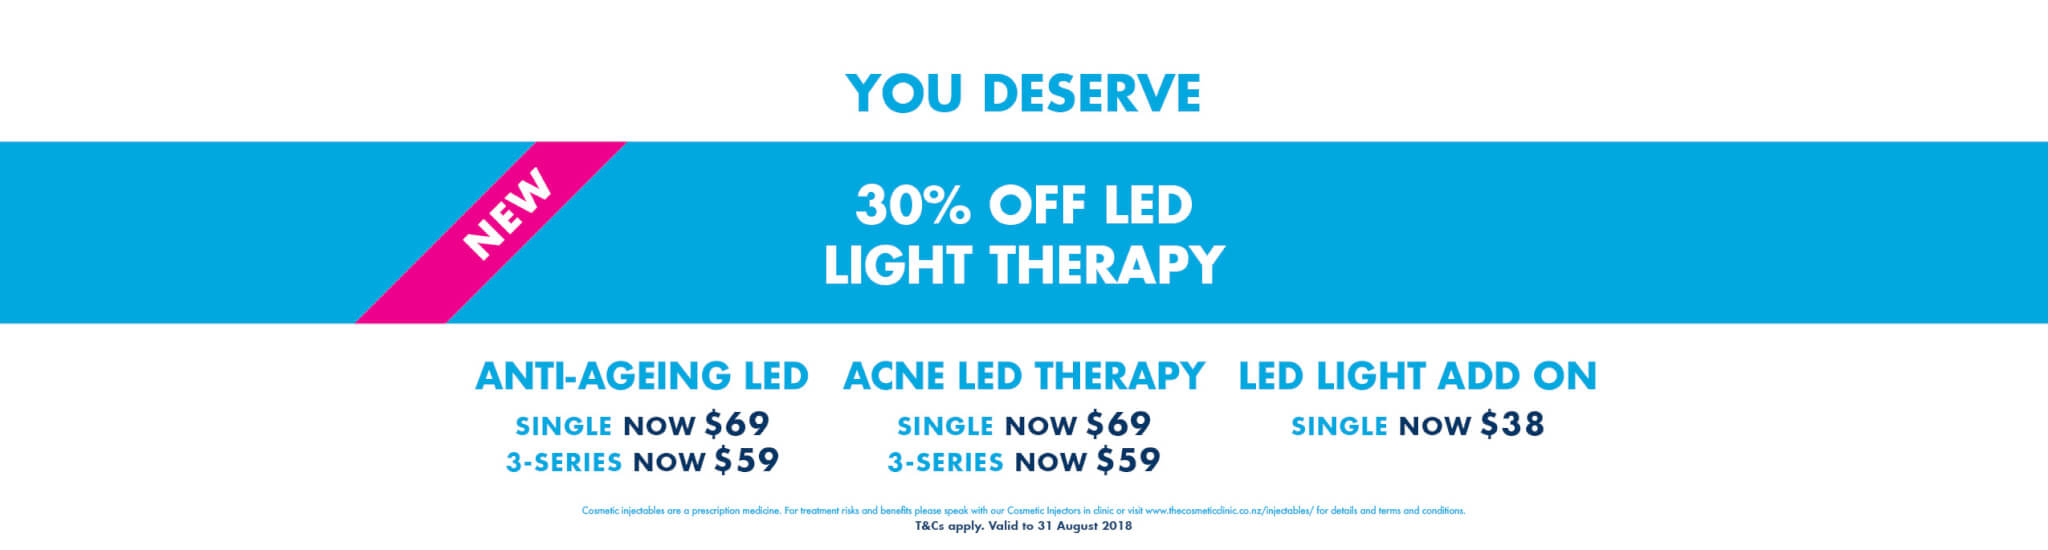 U Deserve 30% OFF LED Light Therapy